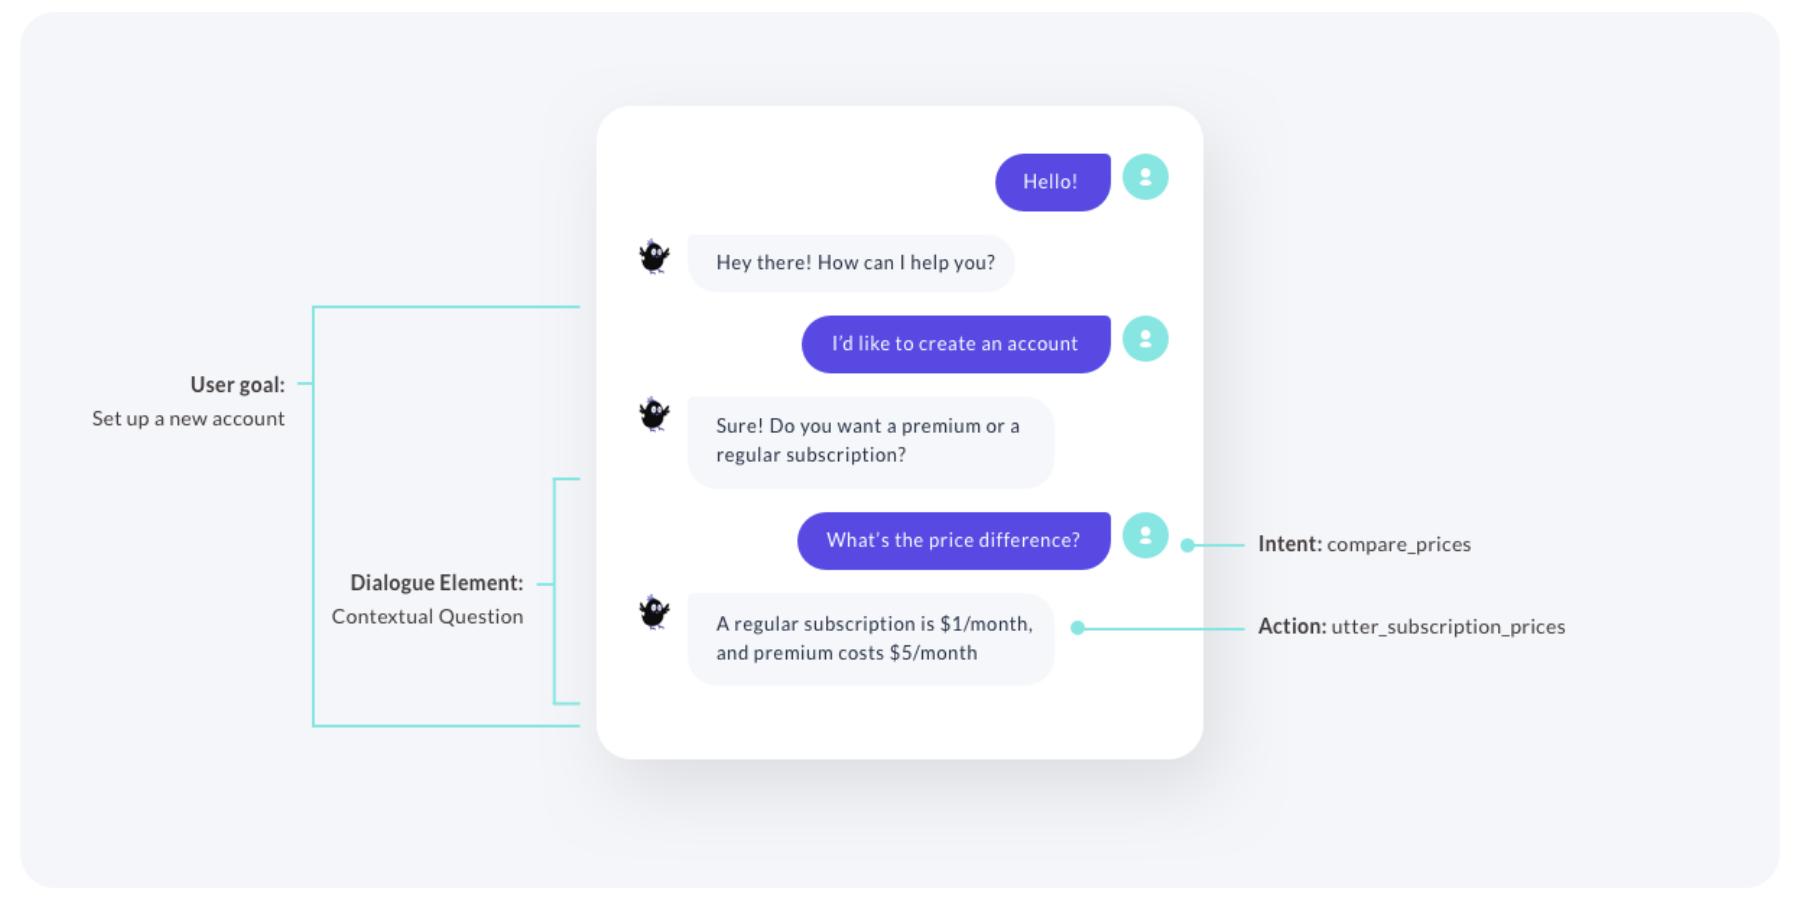 Rasa Releases Open Source AI Assistant Framework 2.0